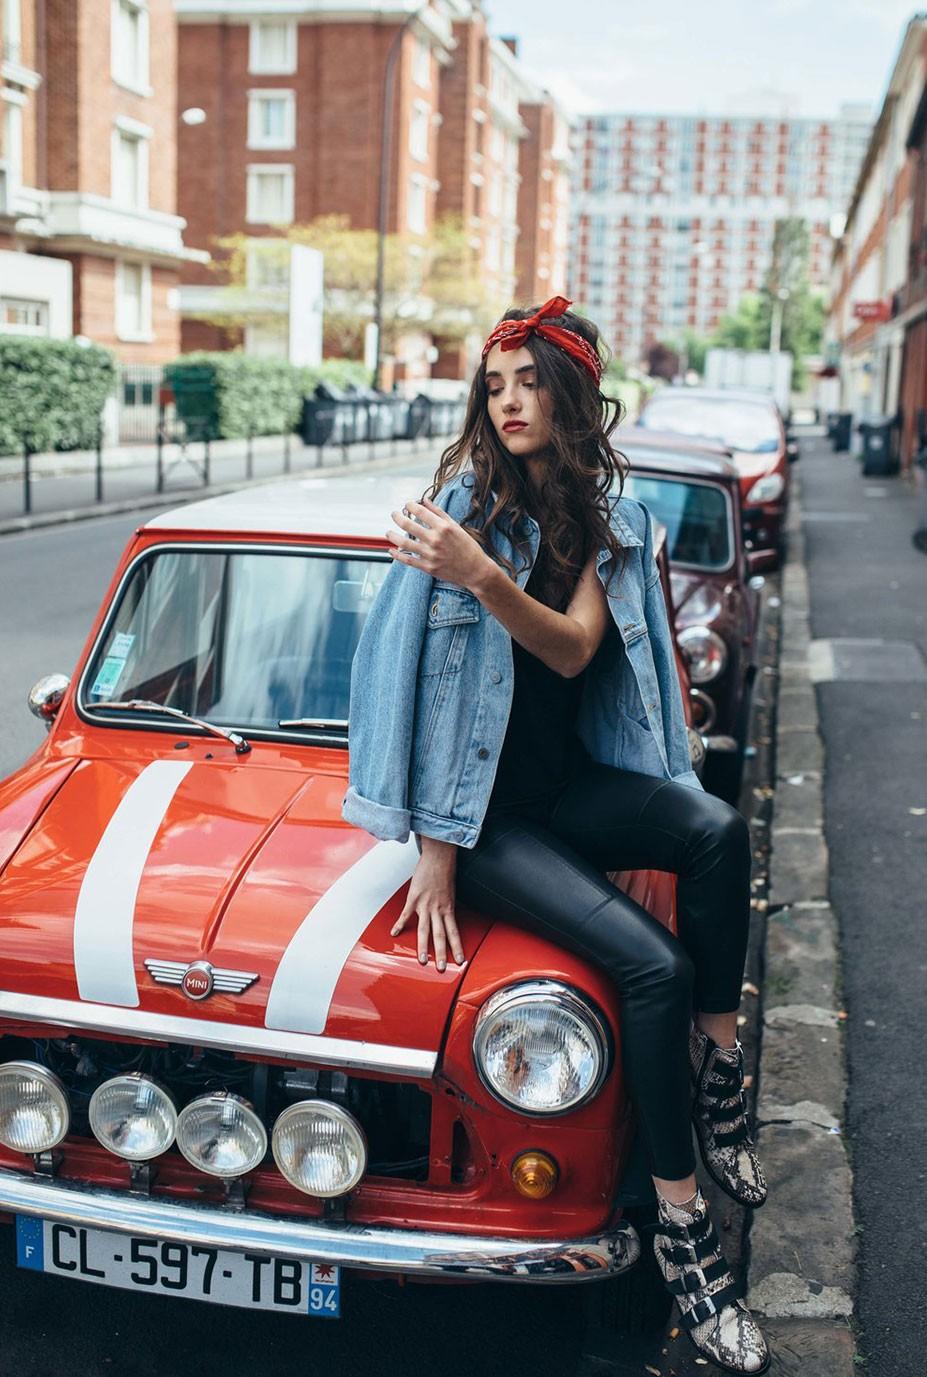 автомобильная фанатка Эльза Кутюрье / Elsa Couturier by Laurent Ponce - Rekt Magazine